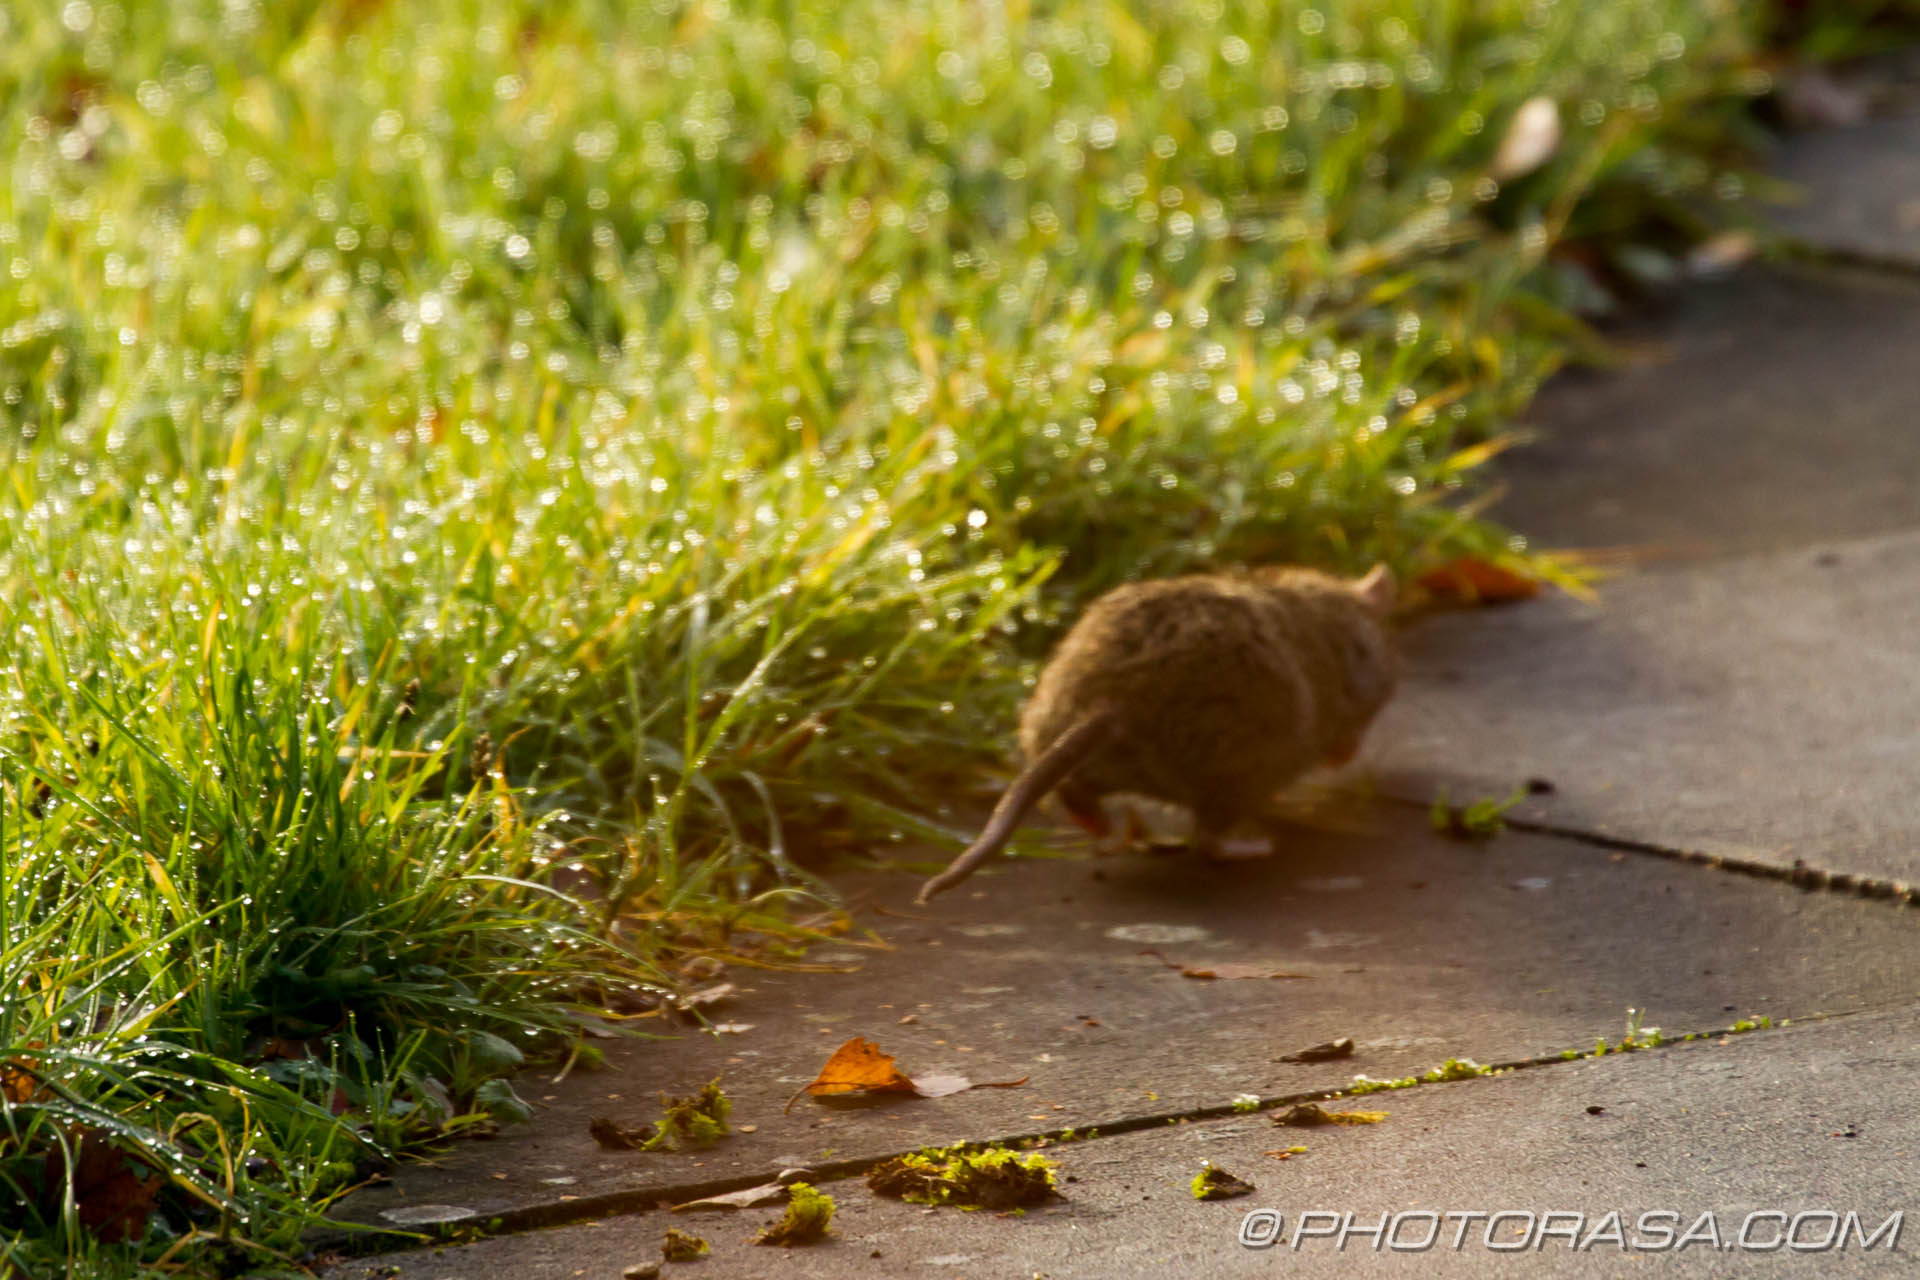 http://photorasa.com/river-rat-maidstone-market/river-rat-scuttling-off/